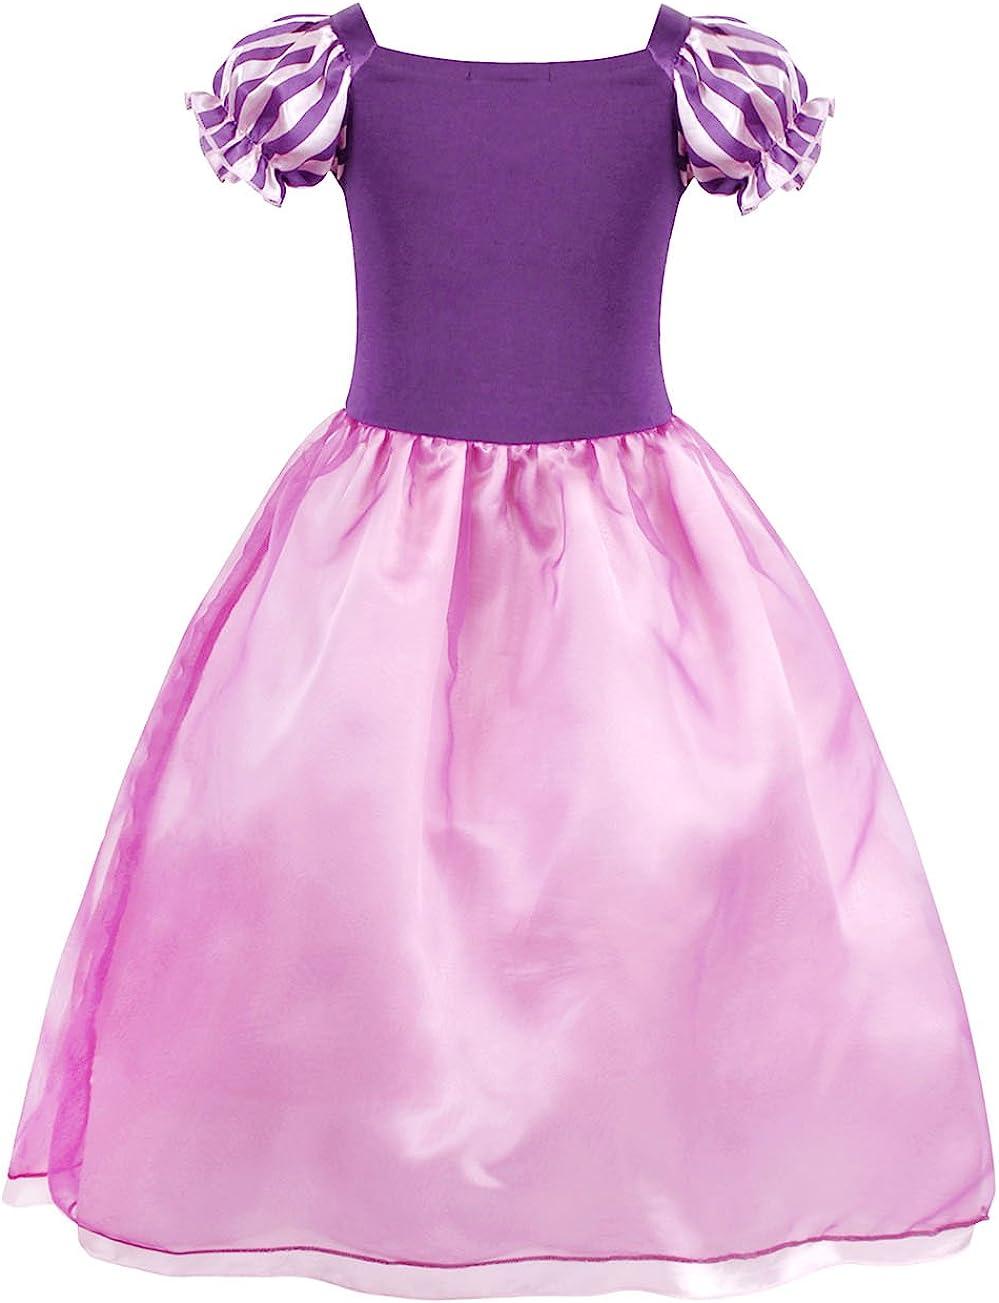 HenzWorld Little Girls Dress Costume Princess Birthday Party Cosplay Wig Headband Accessories Clothes Set Purple